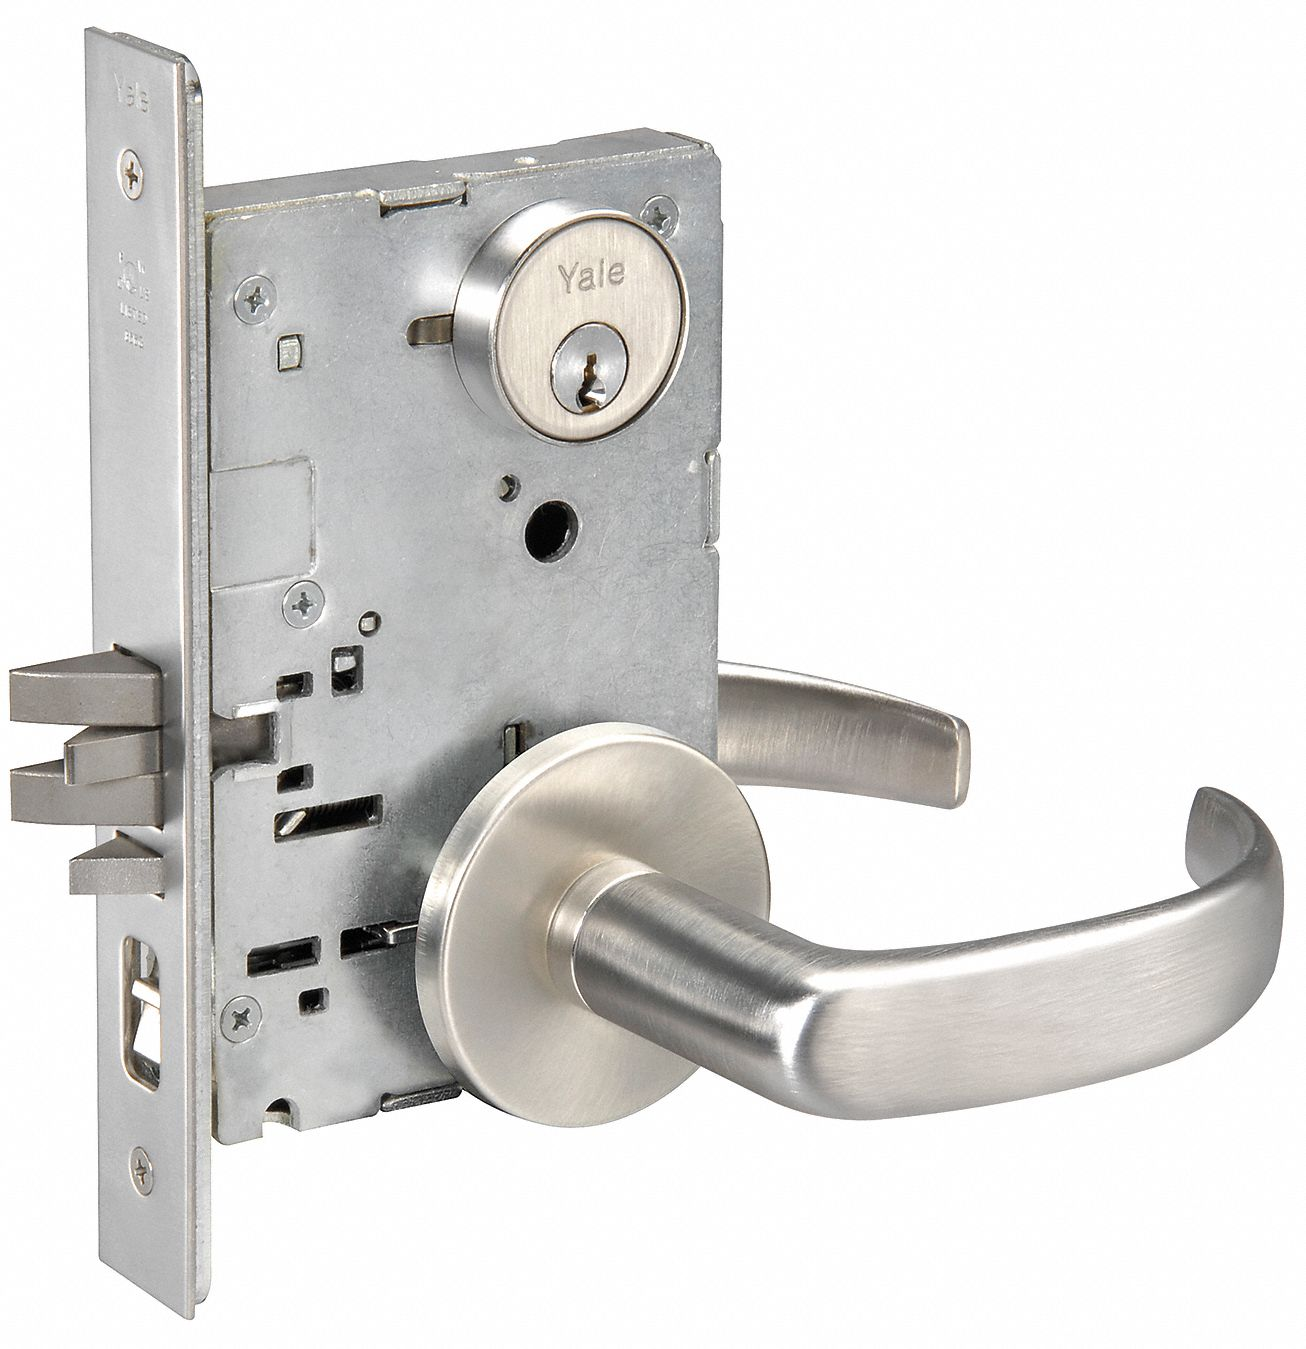 Yale Heavy Duty Mortise Lockset Keyed Different 2 3 4